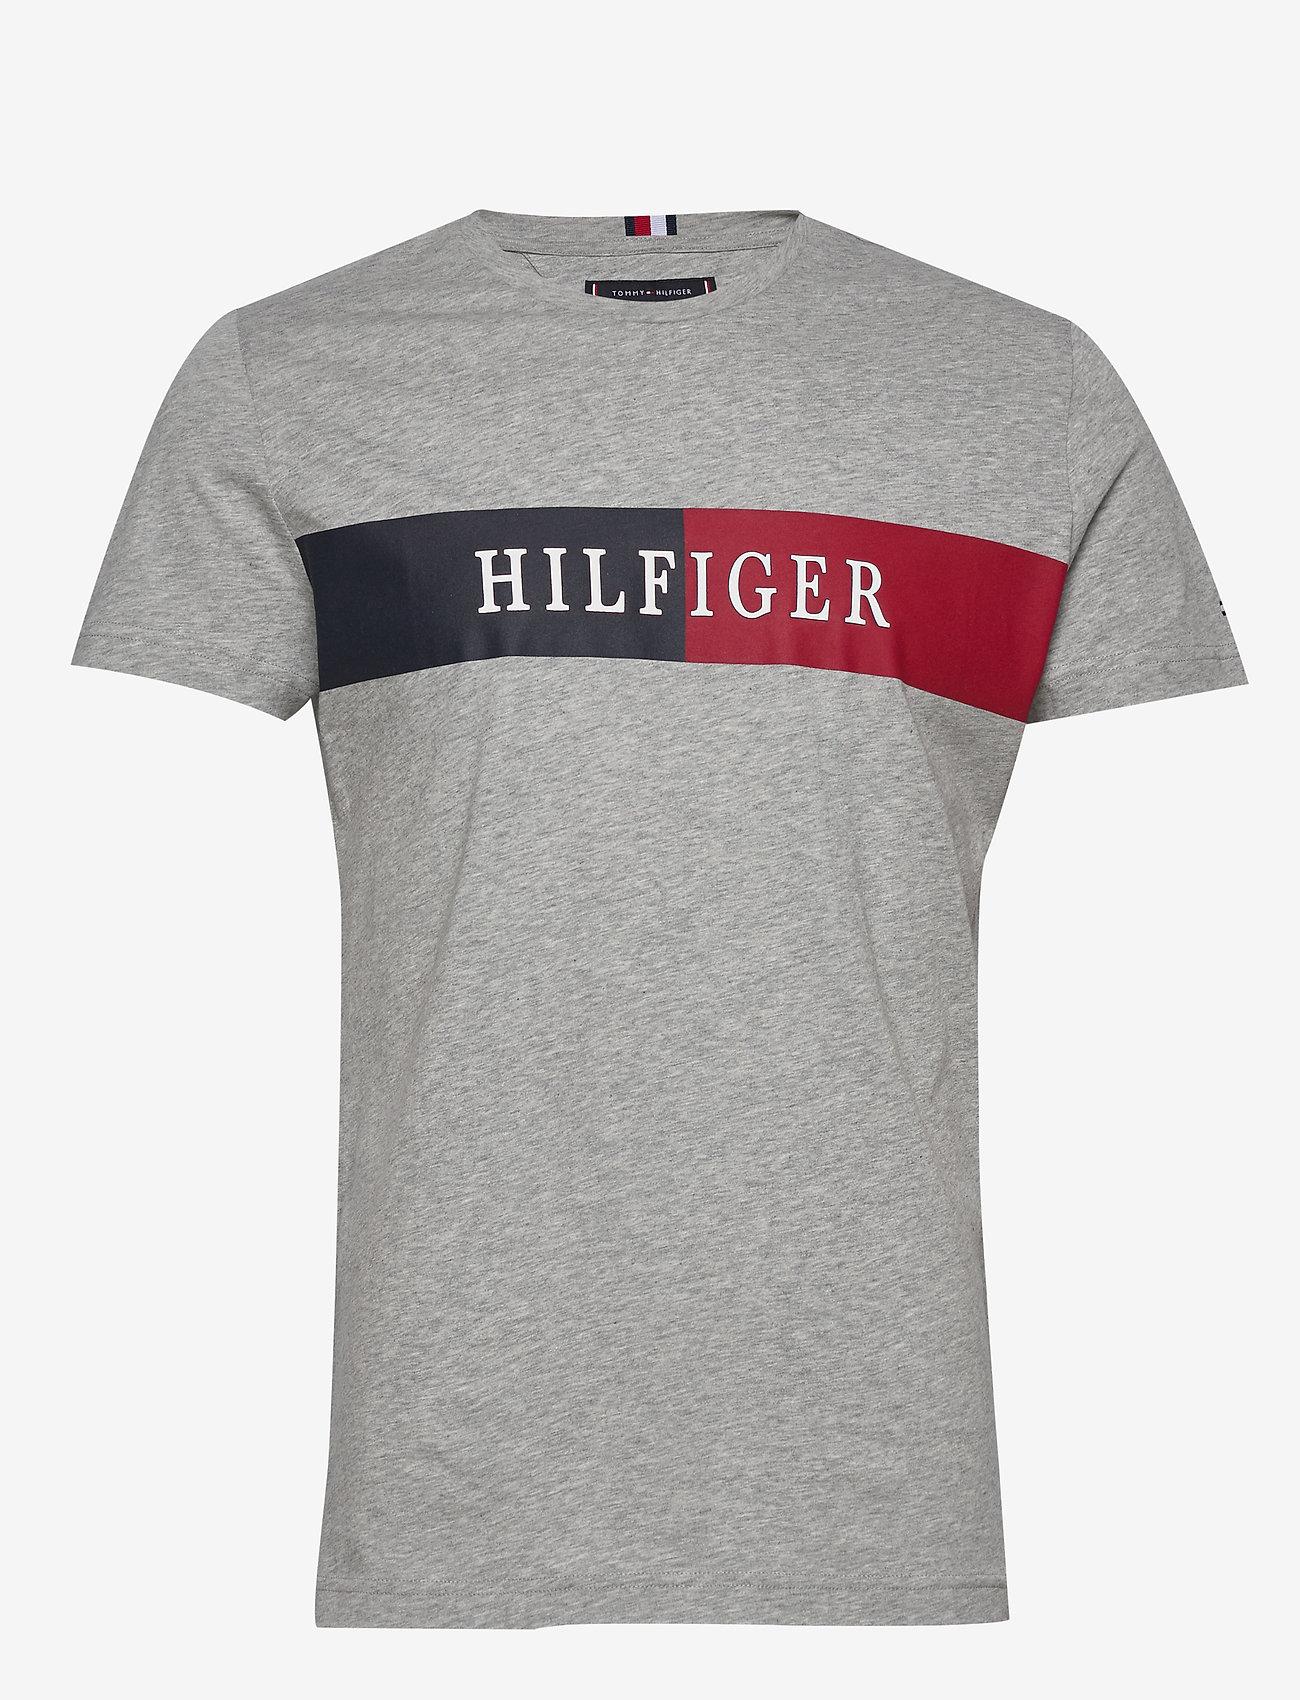 Tommy Hilfiger - BLOCK STRIPE HILFIGE - short-sleeved t-shirts - medium grey heather - 0